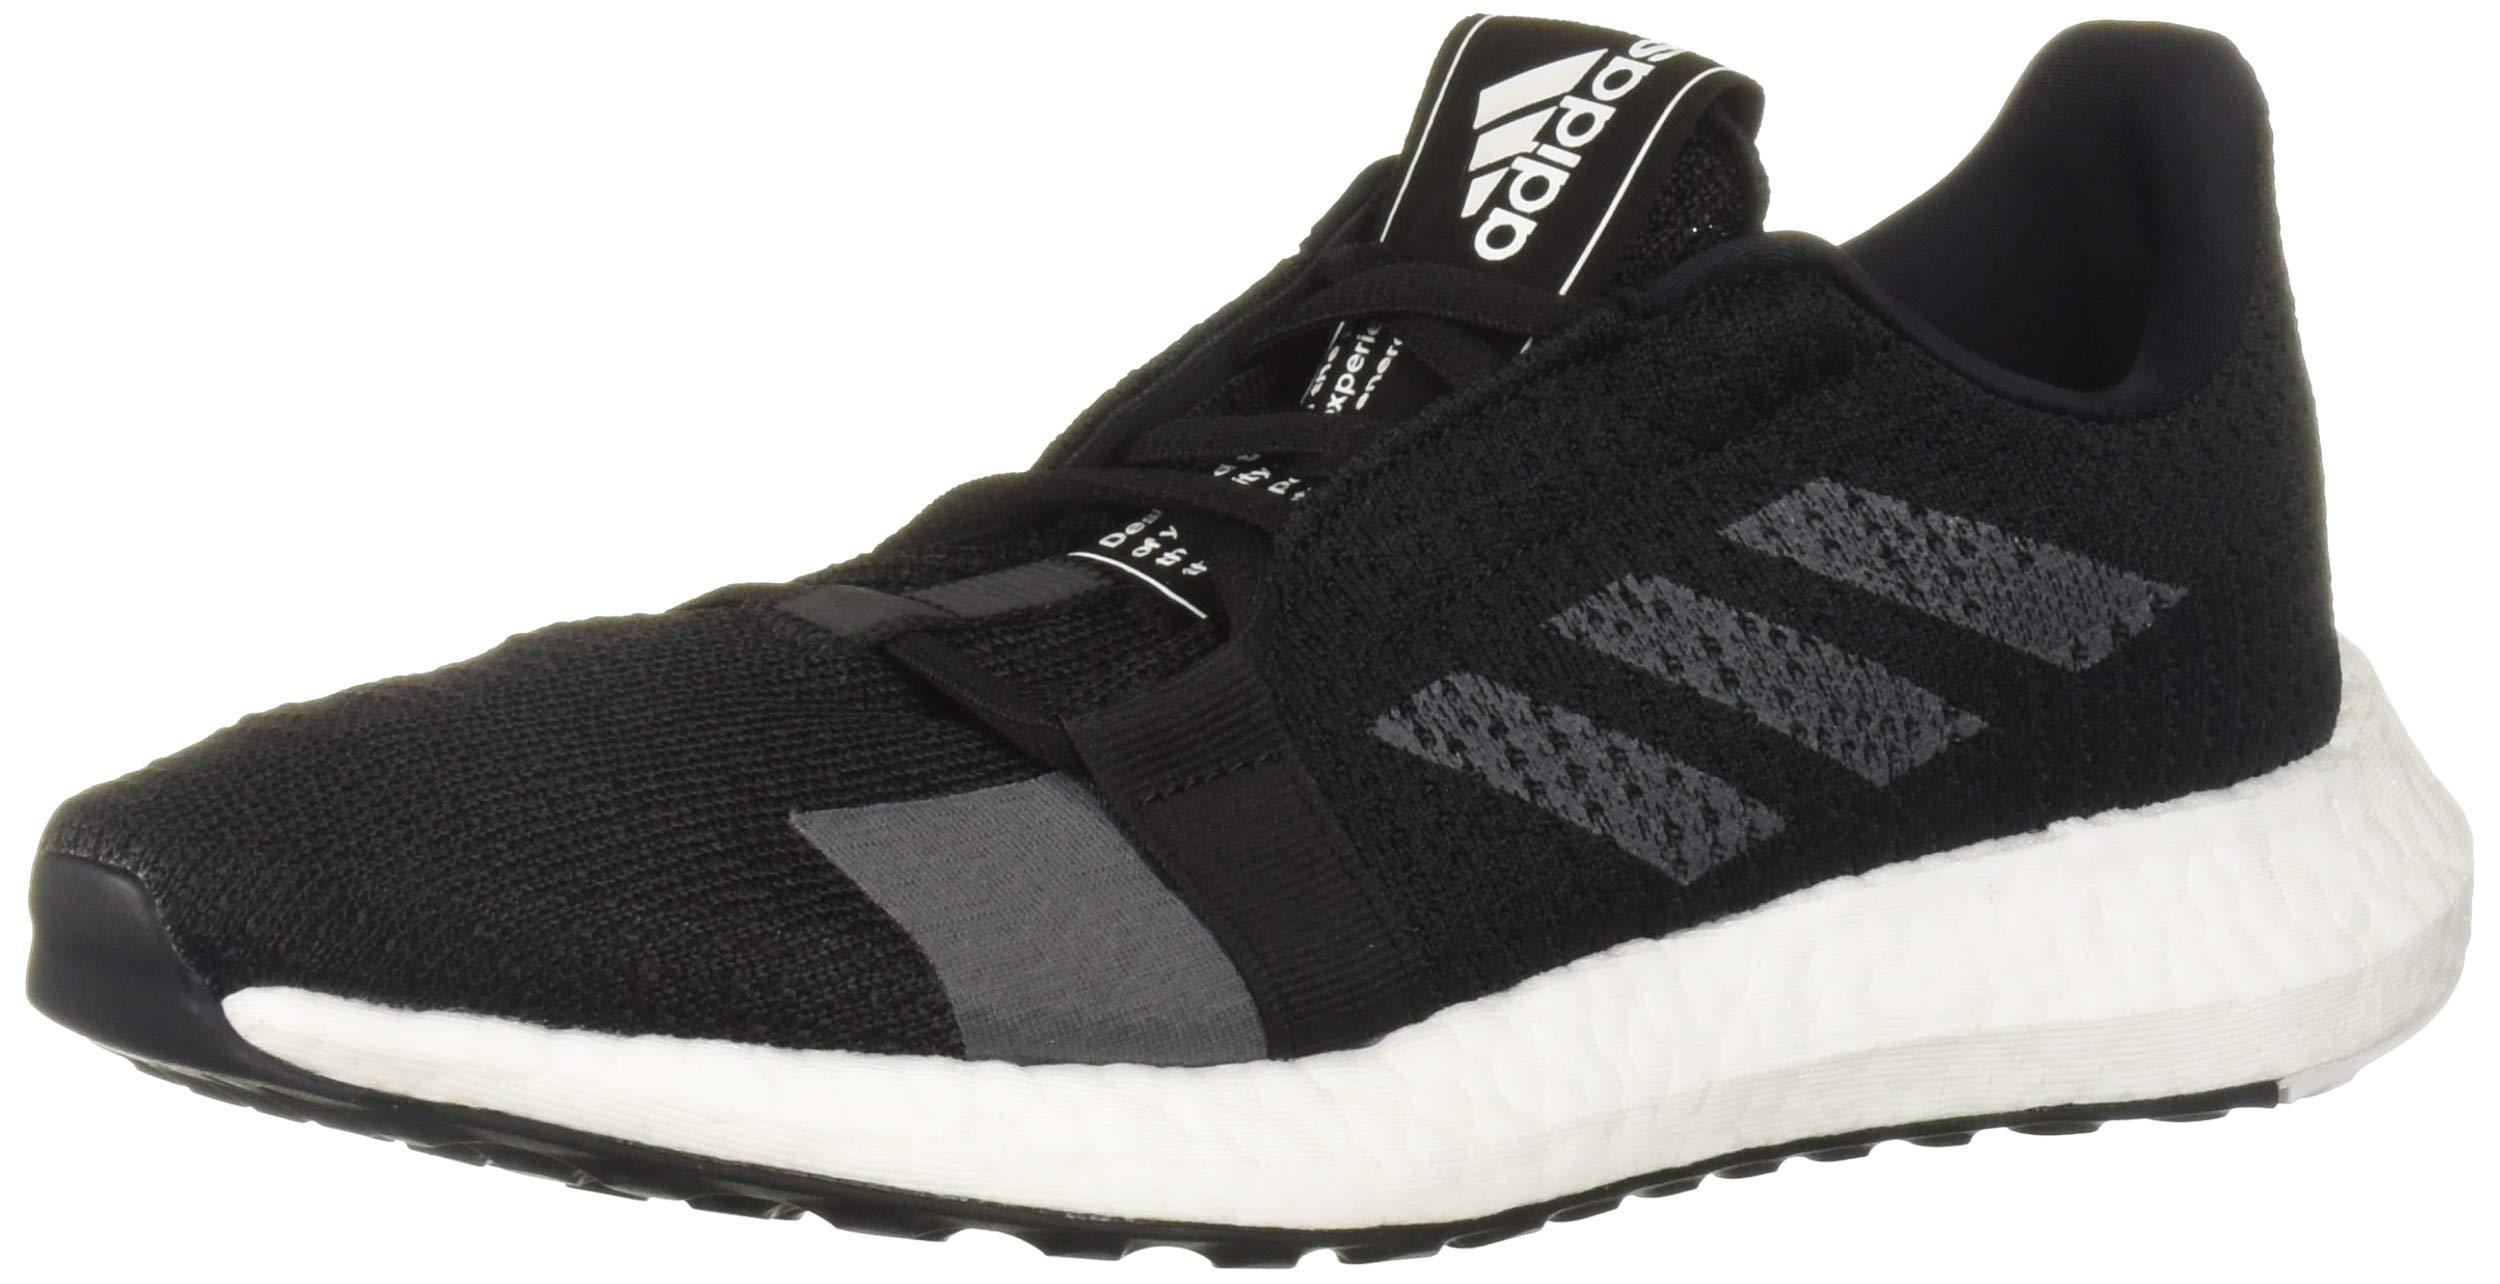 adidas Women's SenseBOOST GO Running Shoe, Black/Grey/White, 5 M US